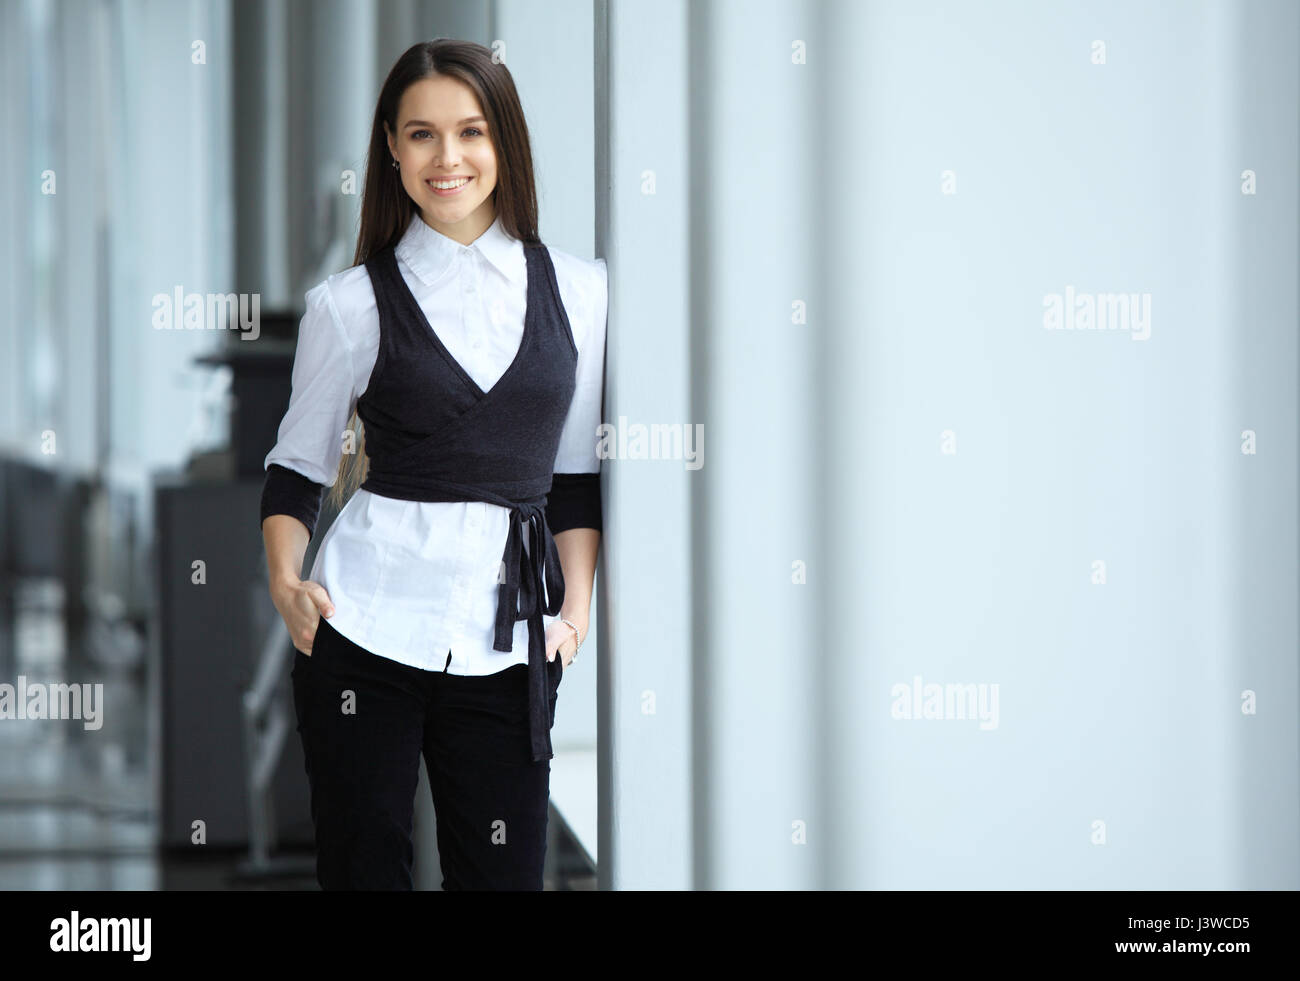 Moderne Business Frau Im Büro Stockfoto Bild 140085489 Alamy